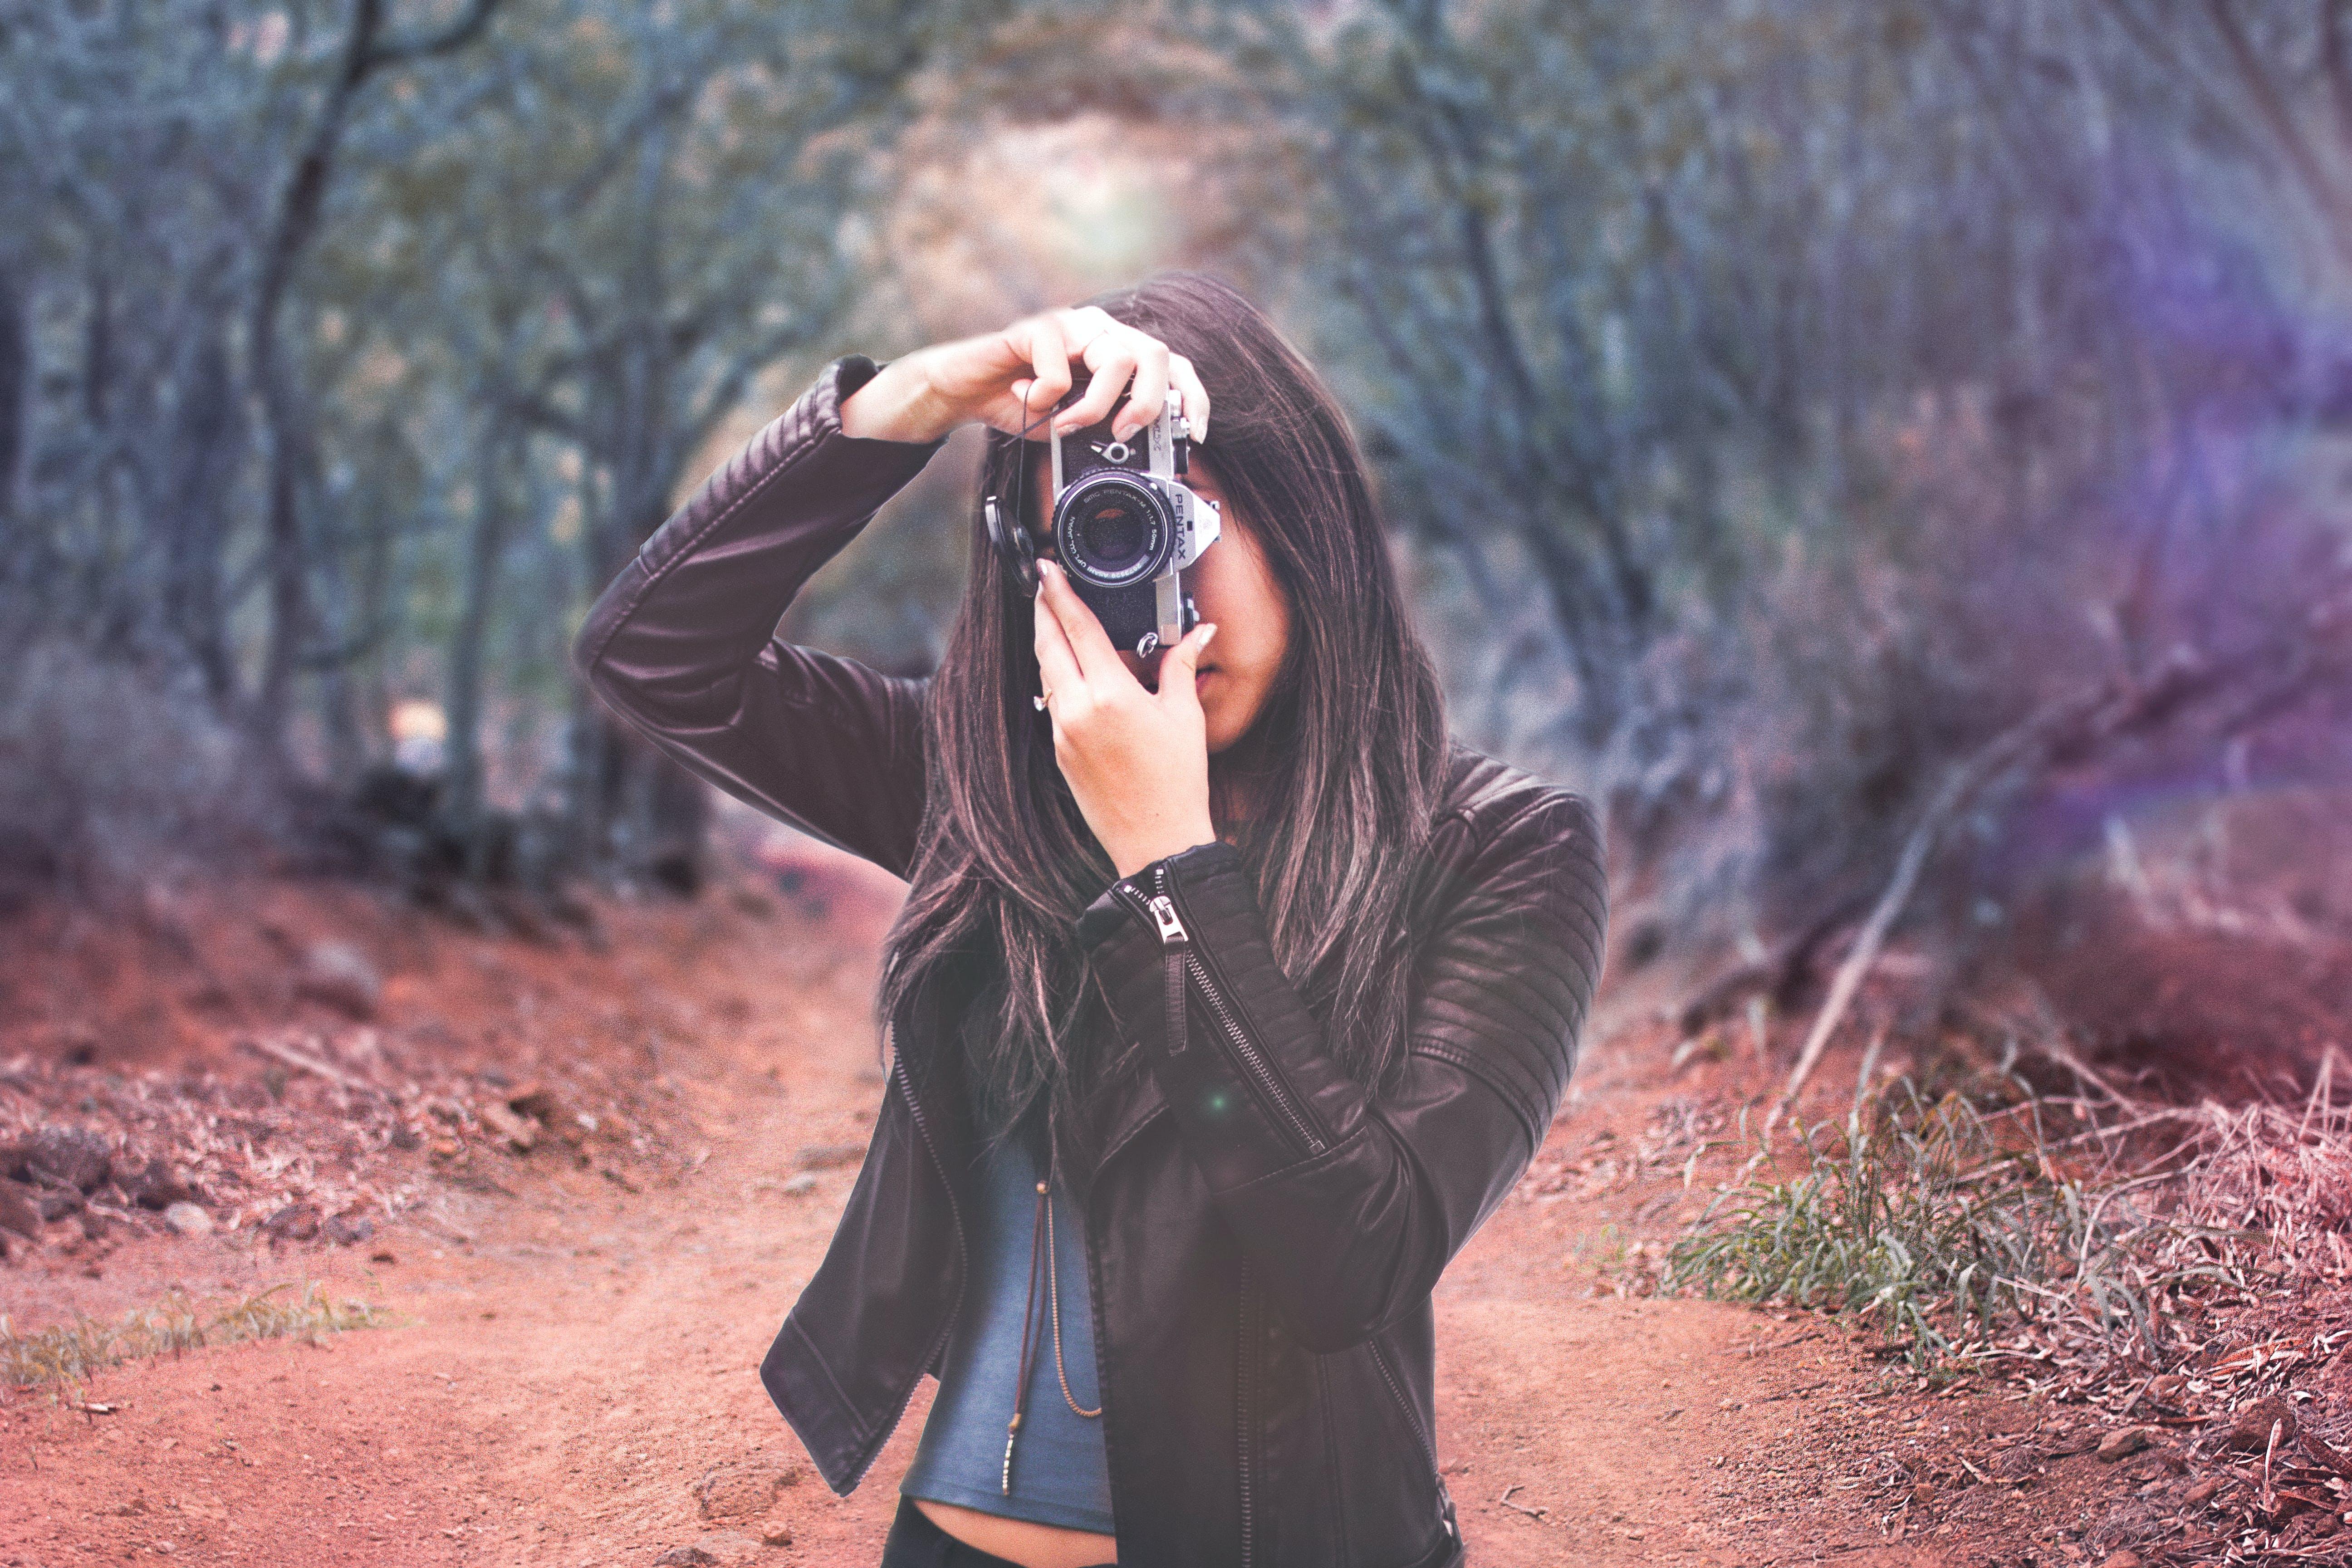 Woman Wearing Black Leather Jacket Holding Camera